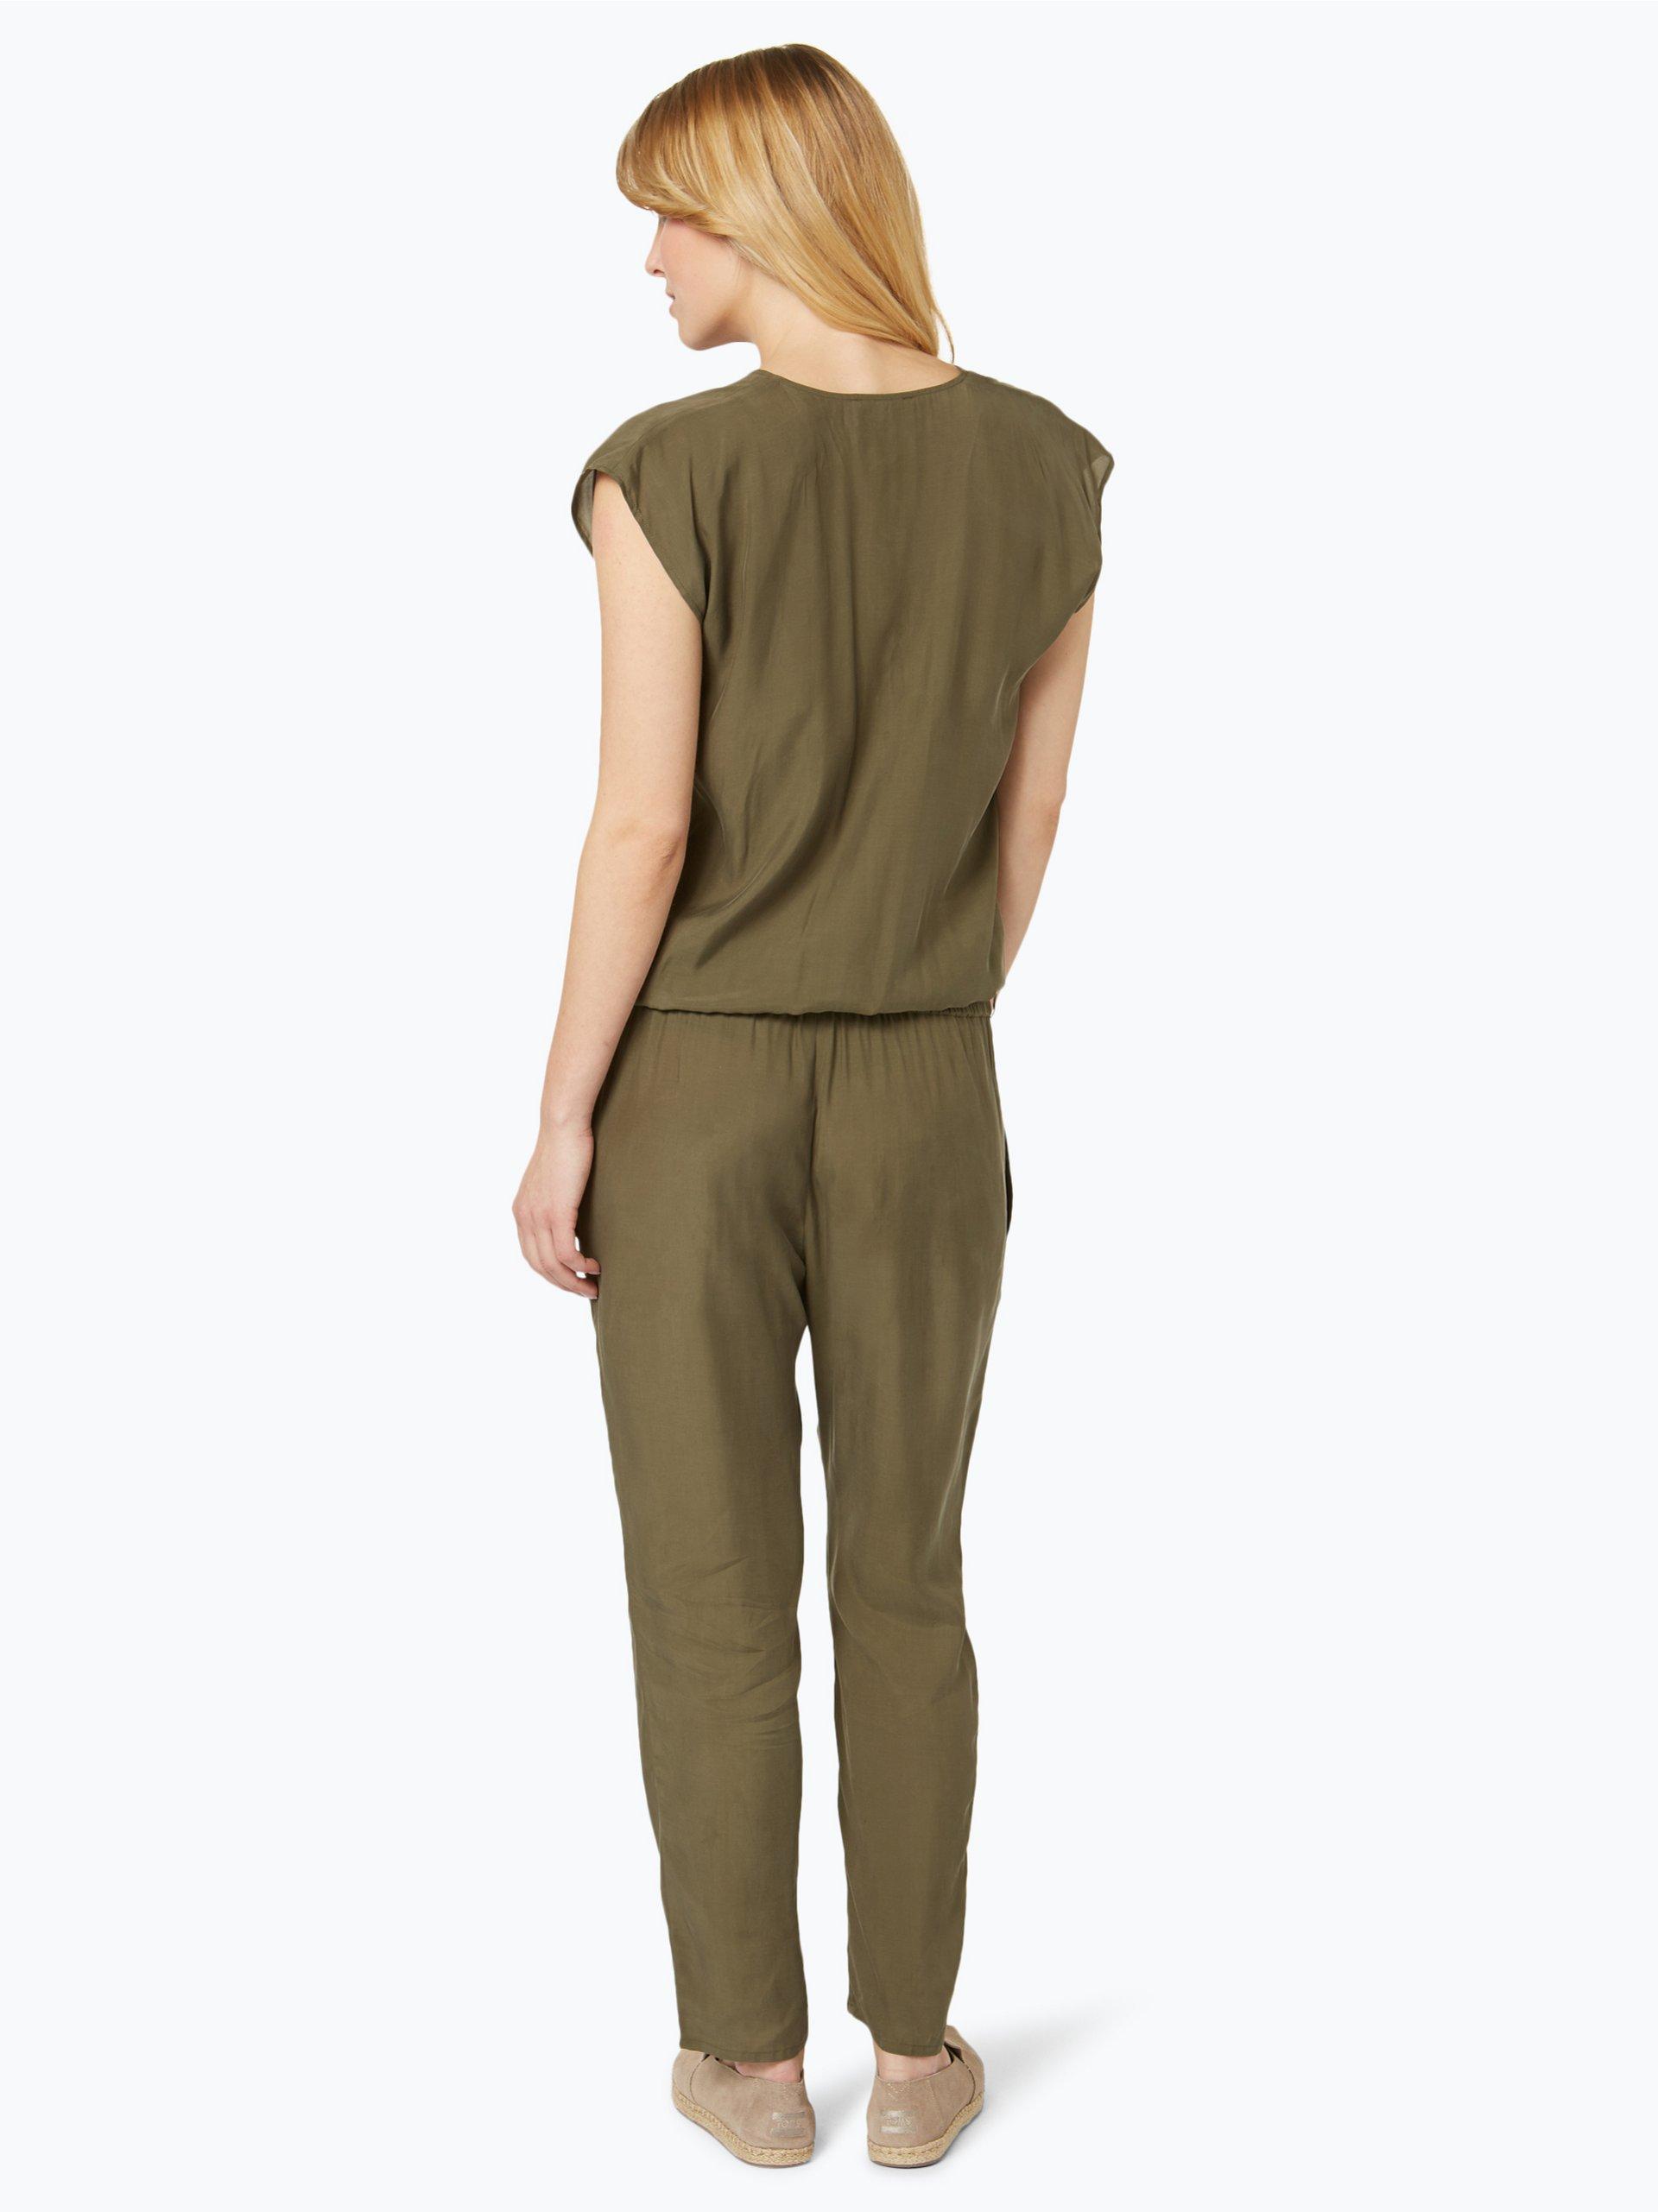 drykorn damen jumpsuit tova wei uni online kaufen. Black Bedroom Furniture Sets. Home Design Ideas